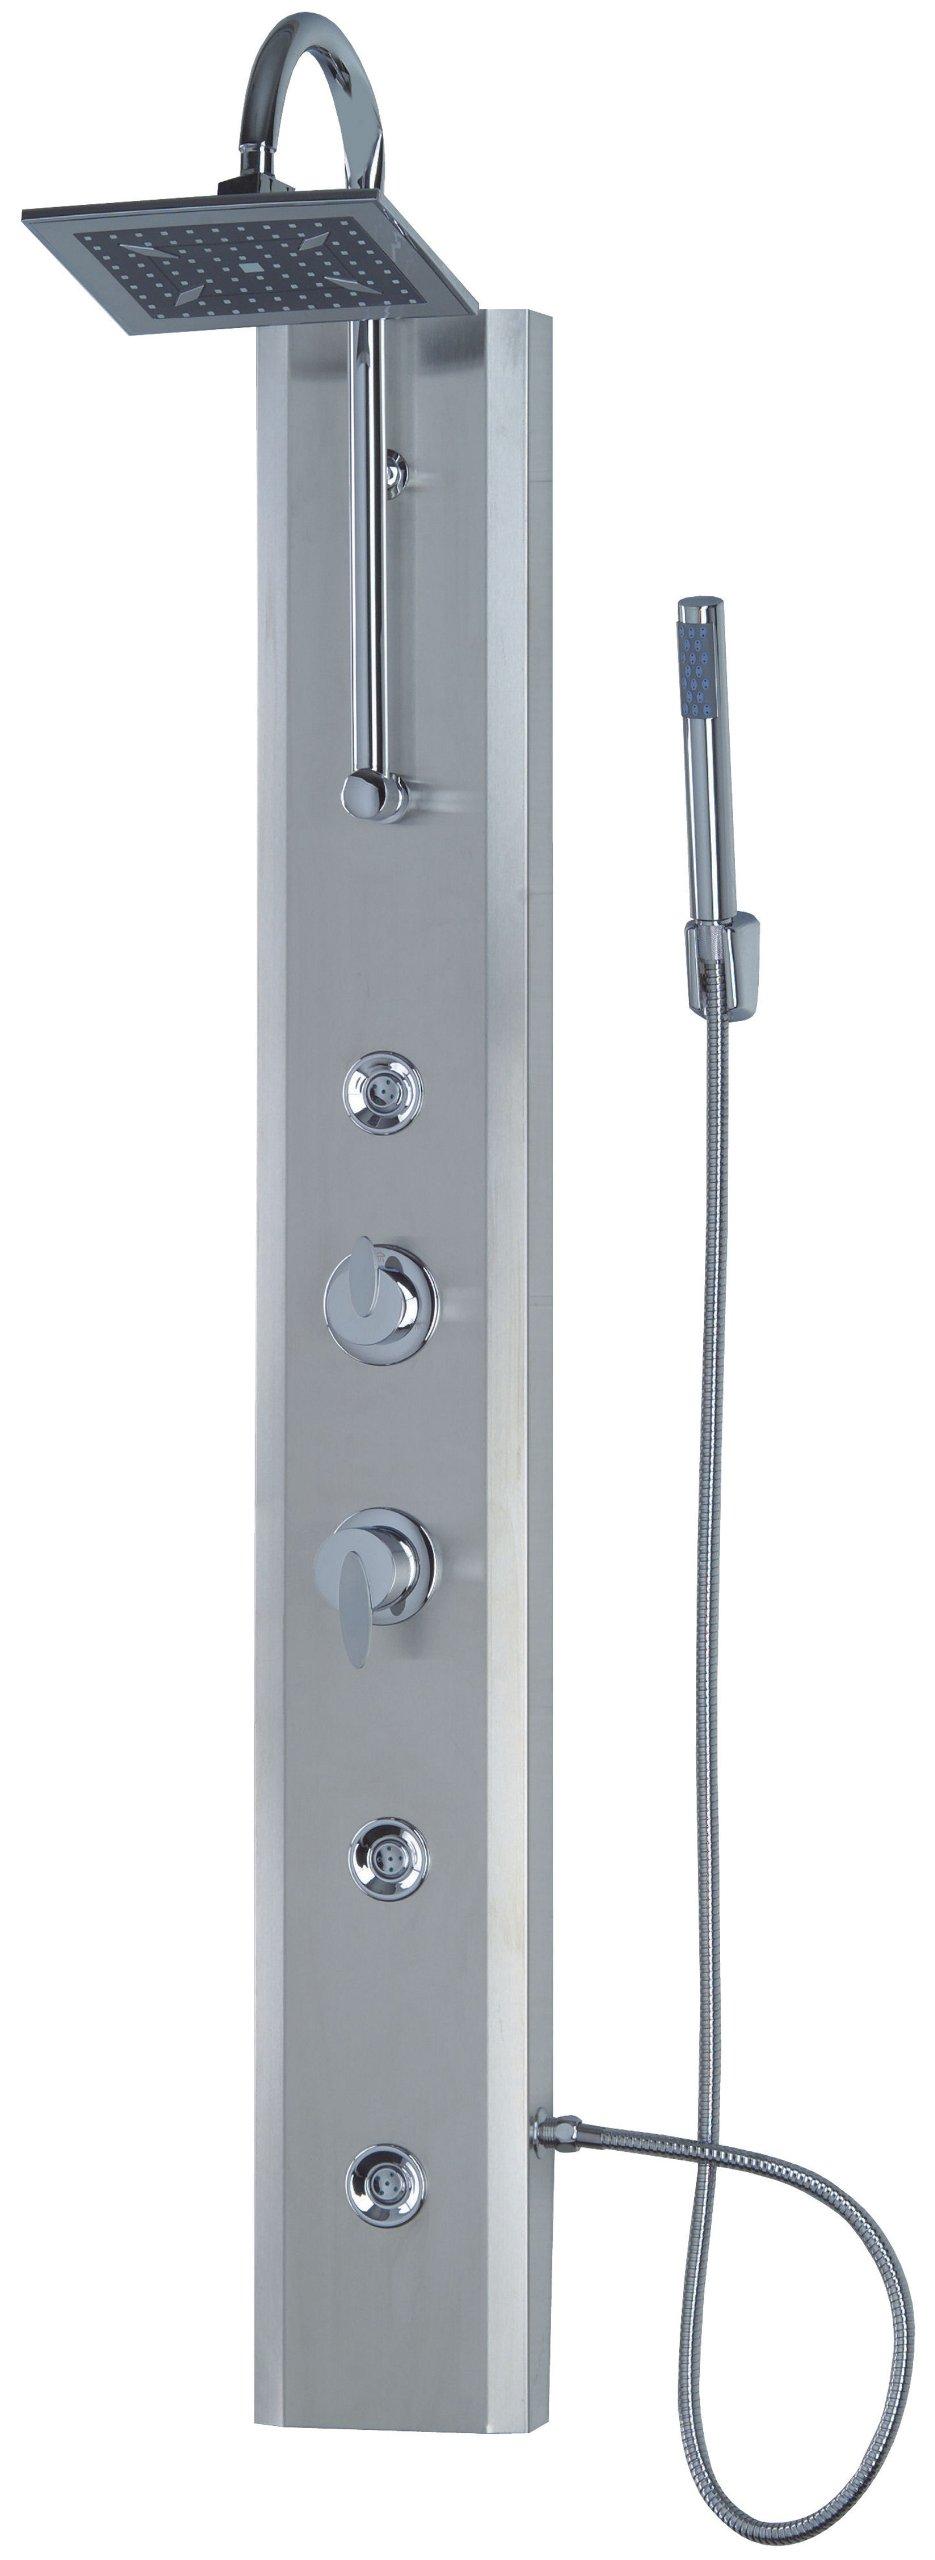 EISL ORSP-YMSE Columna de ducha Linea